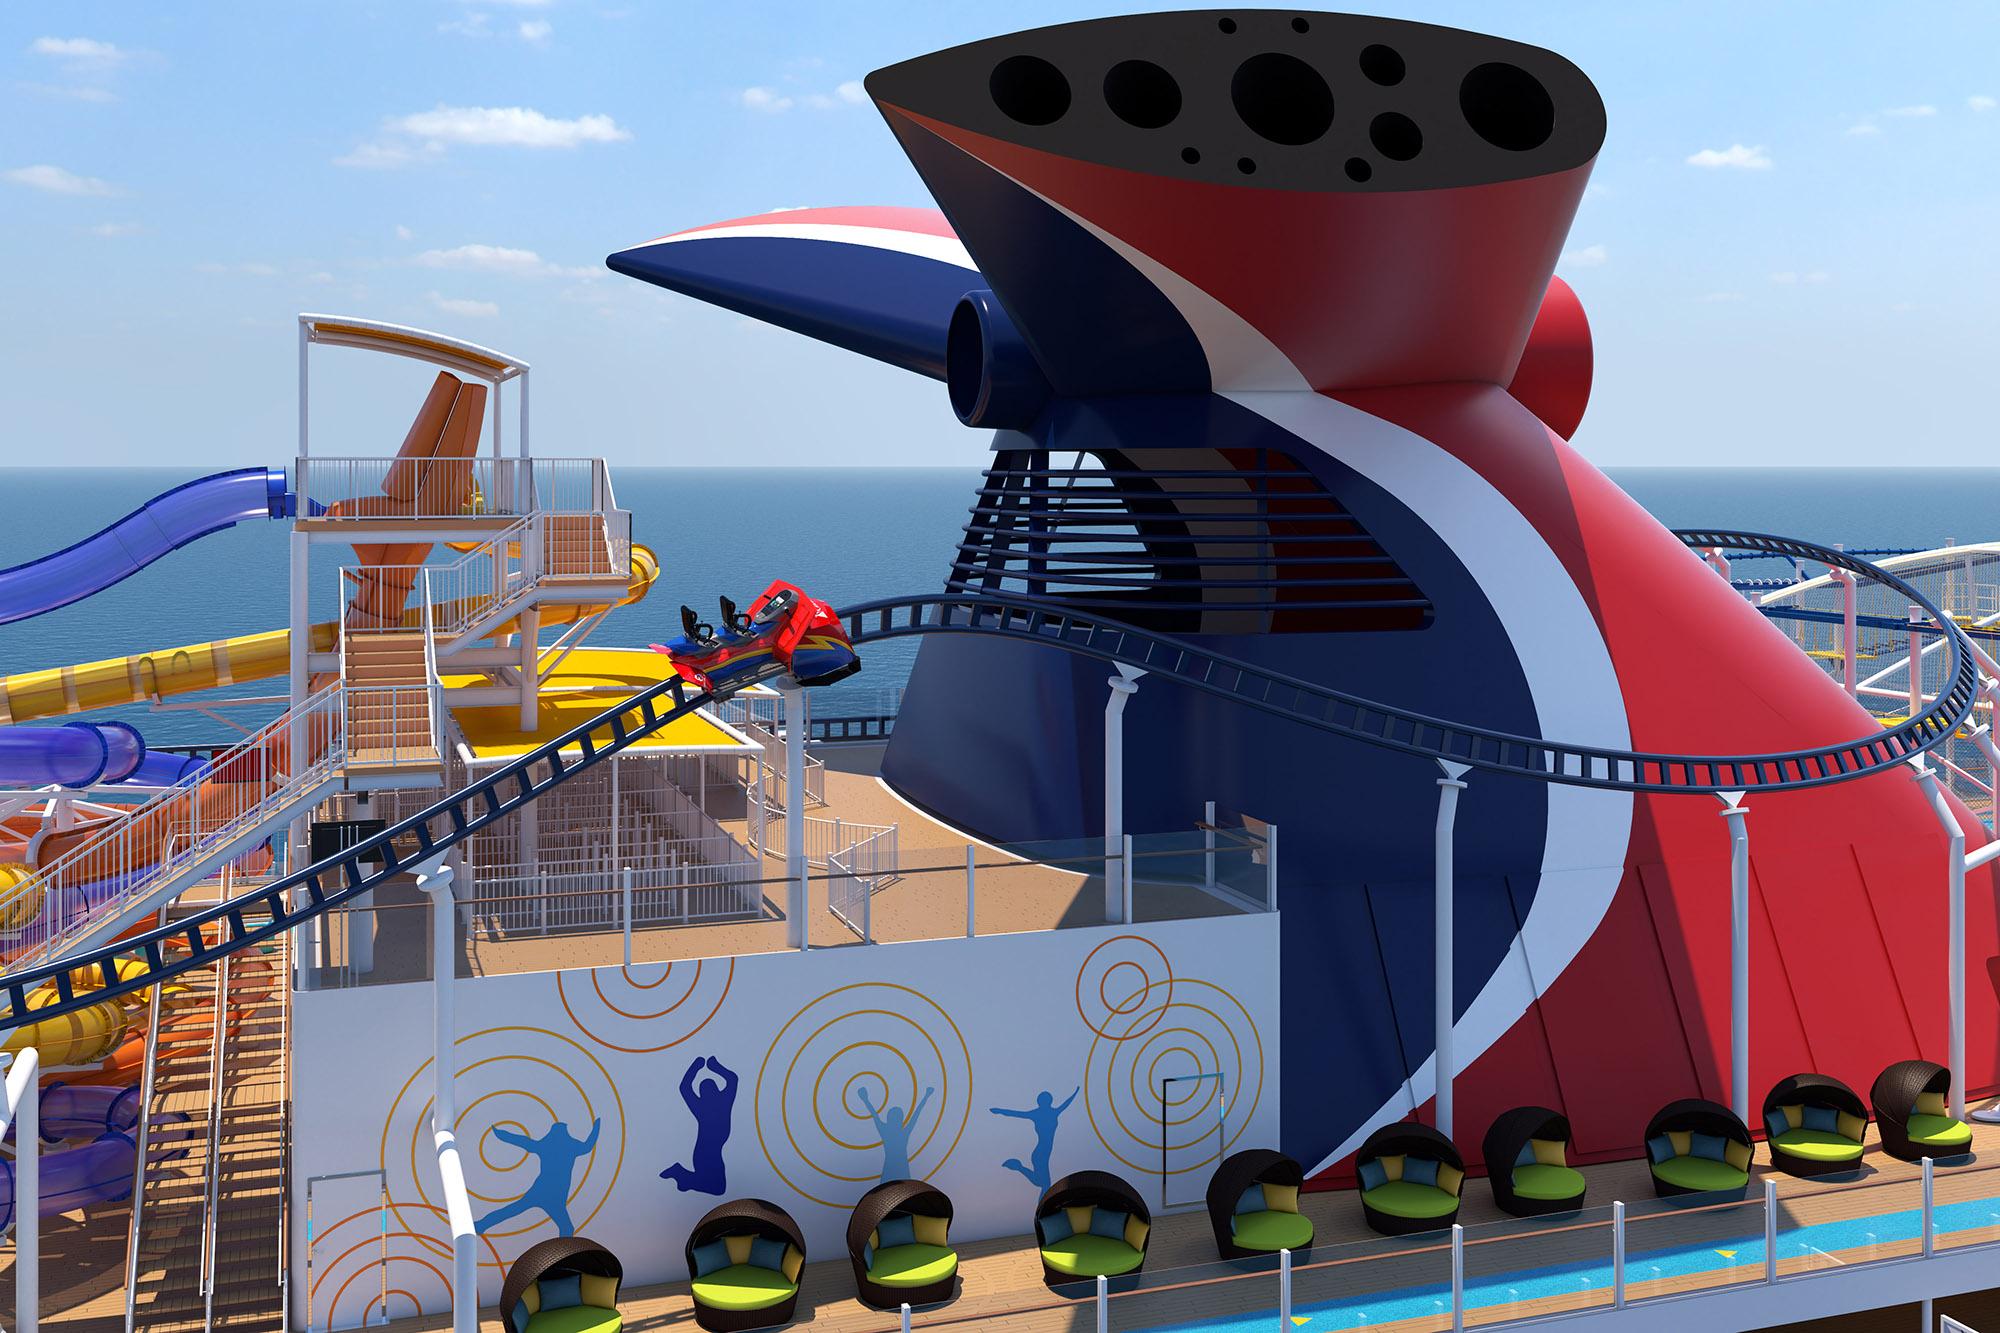 Carnival Cruises Mardi Gras Bolt roller coaster